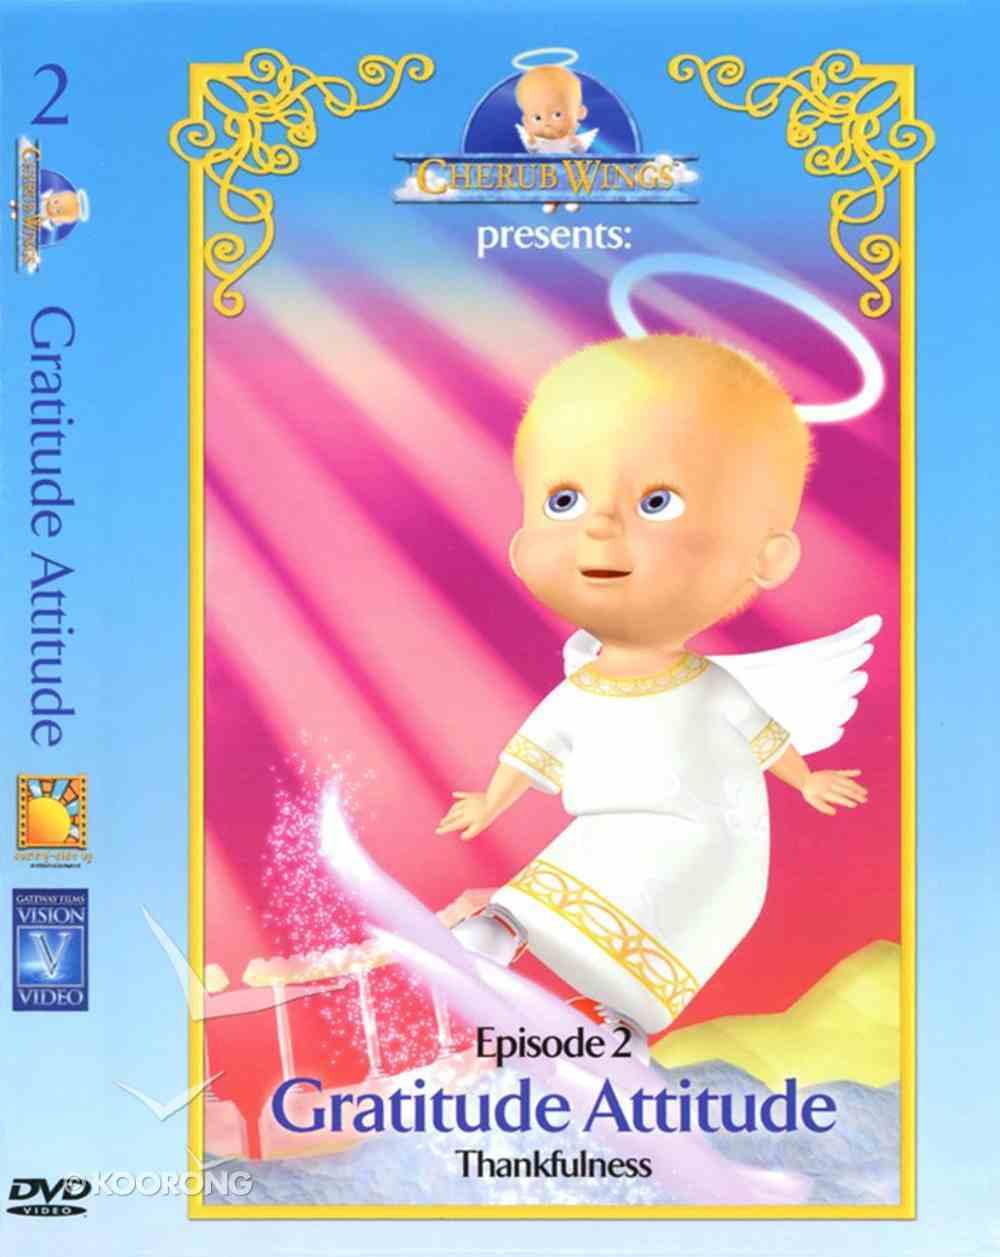 Gratitude Attitude (#02 in Cherub Wings (Dvd) Series) DVD